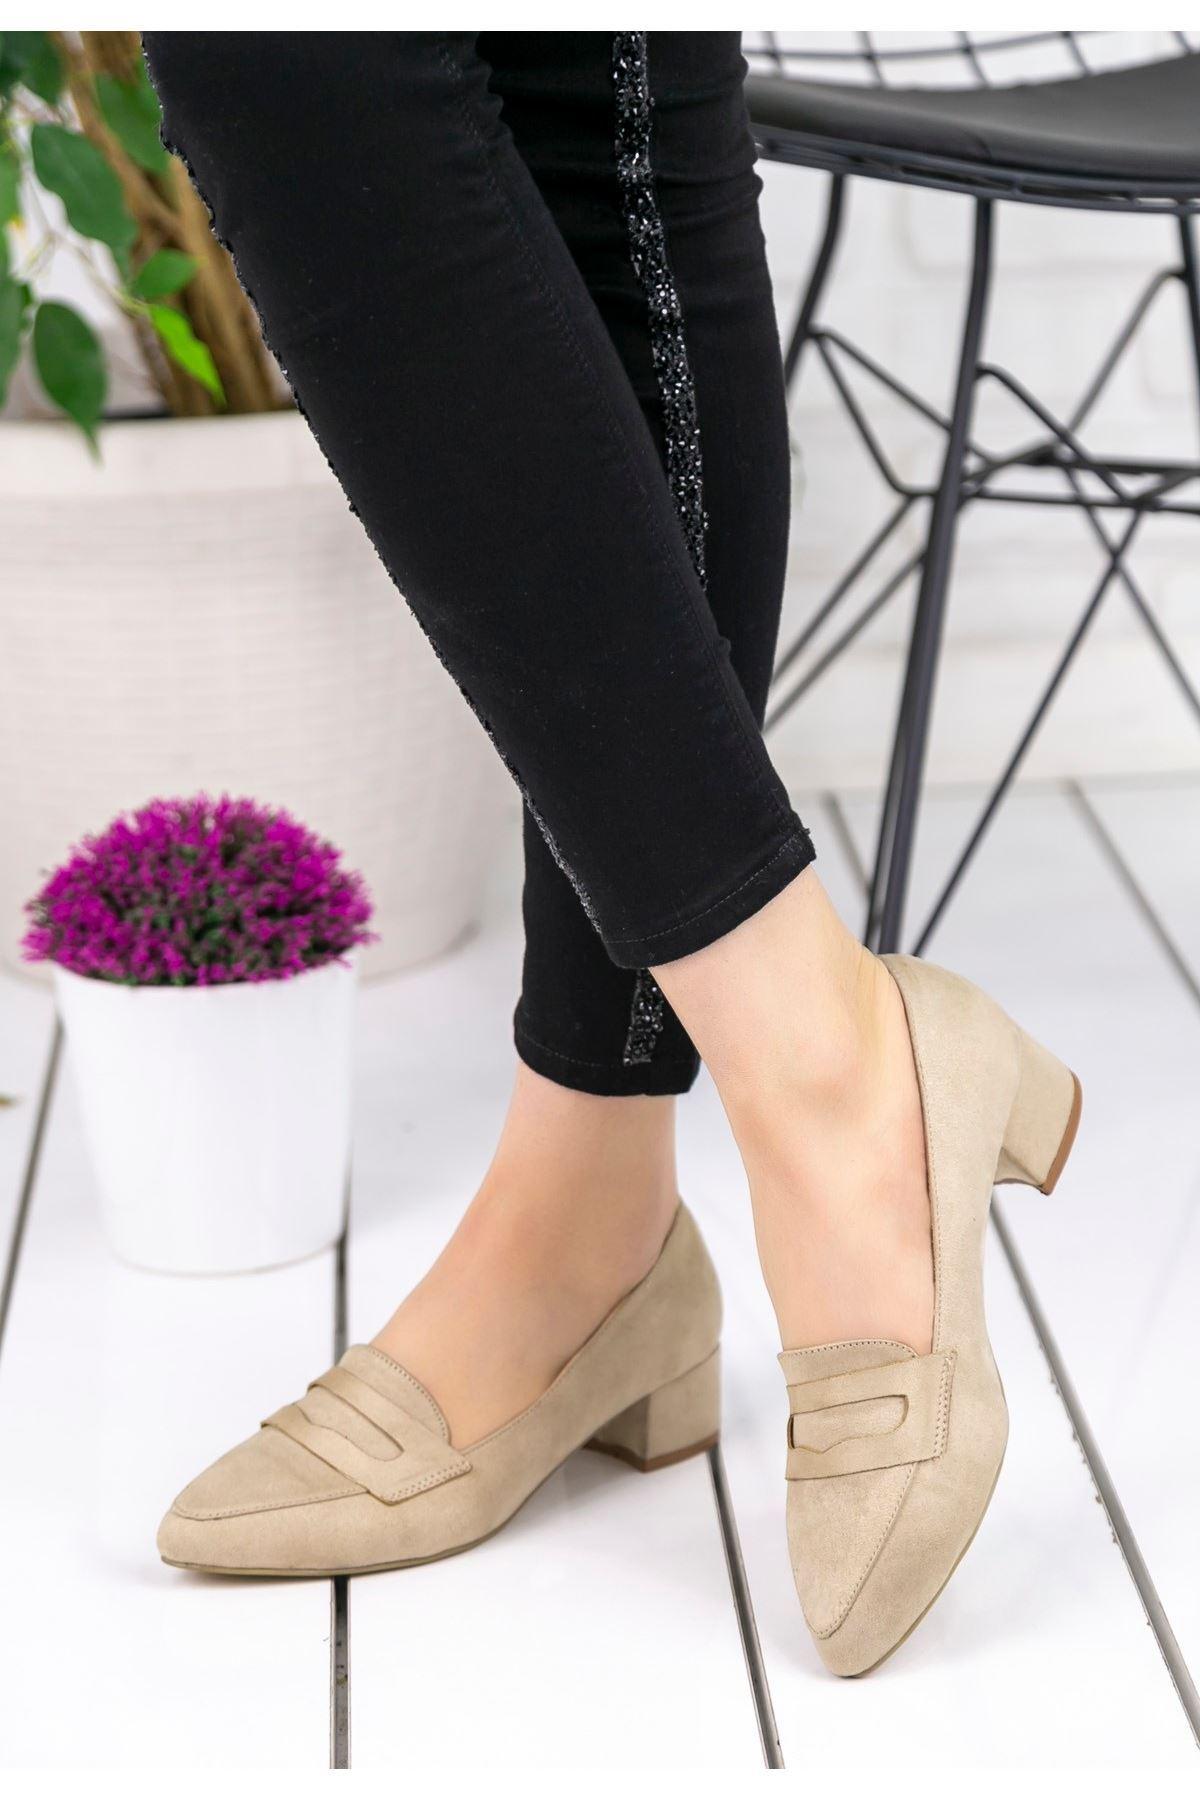 Reyna Krem Süet Topuklu Ayakkabı